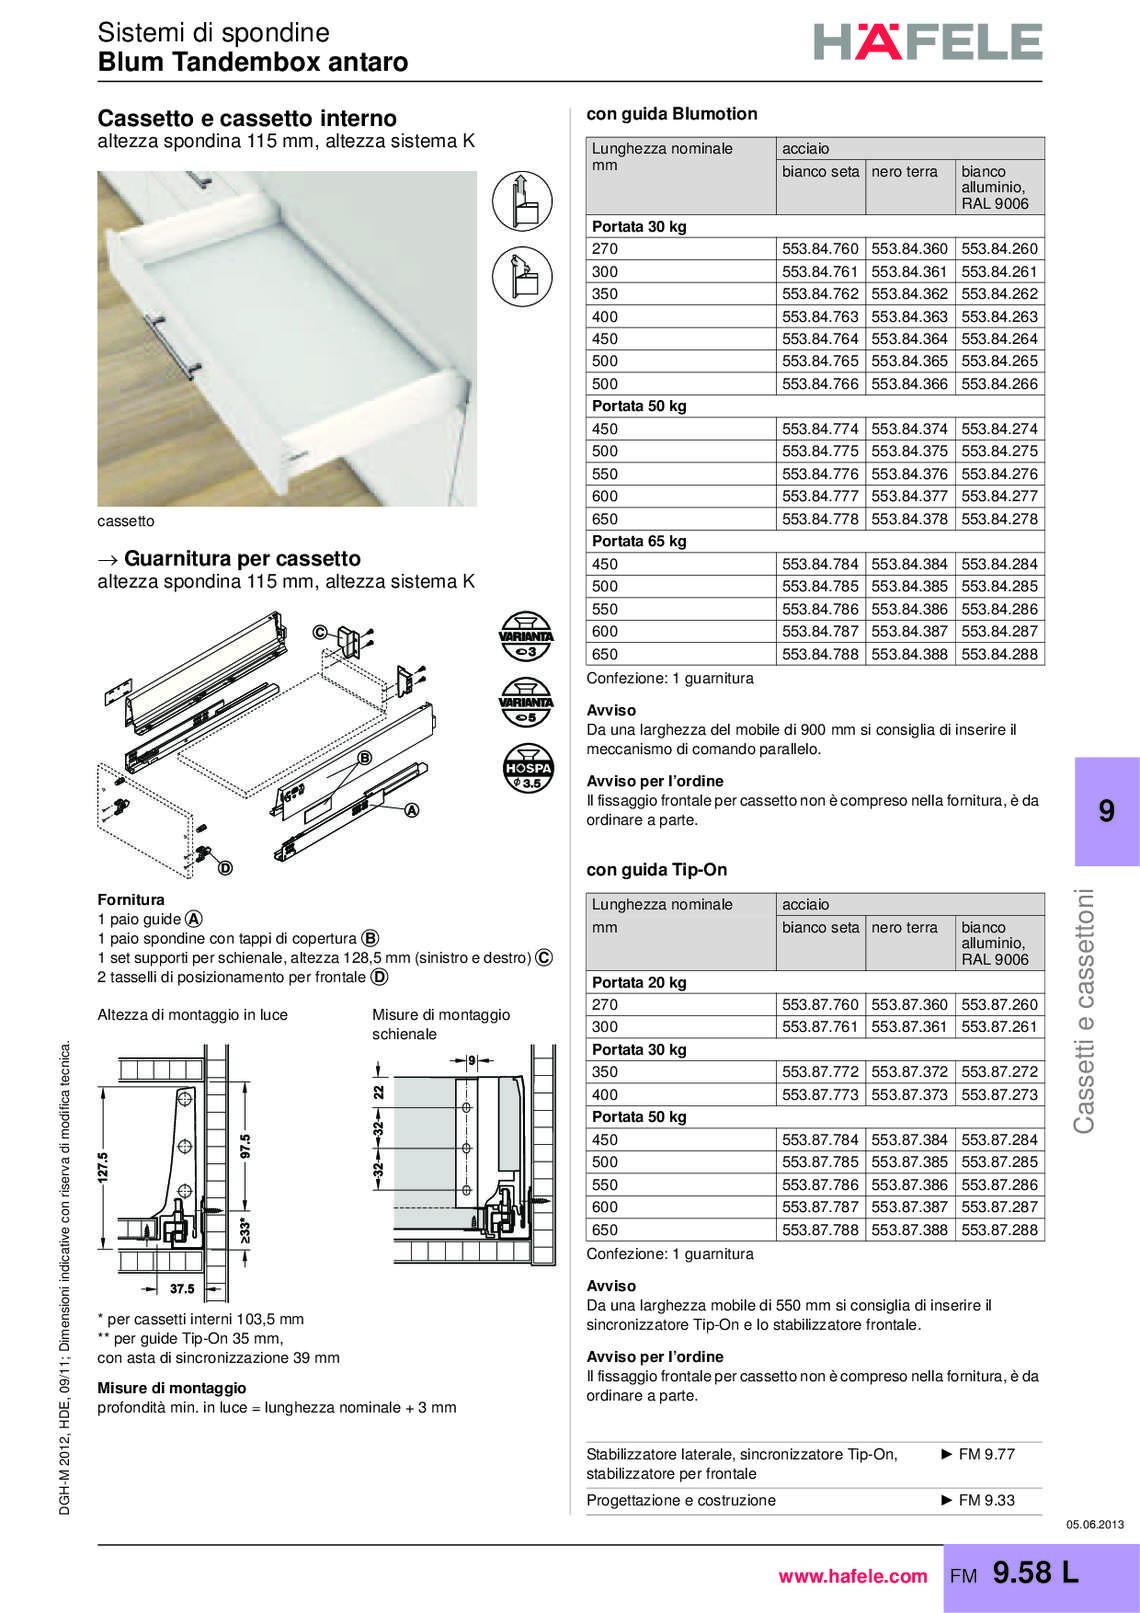 hafele-spondine-e-guide-per-mobili_40_086.jpg